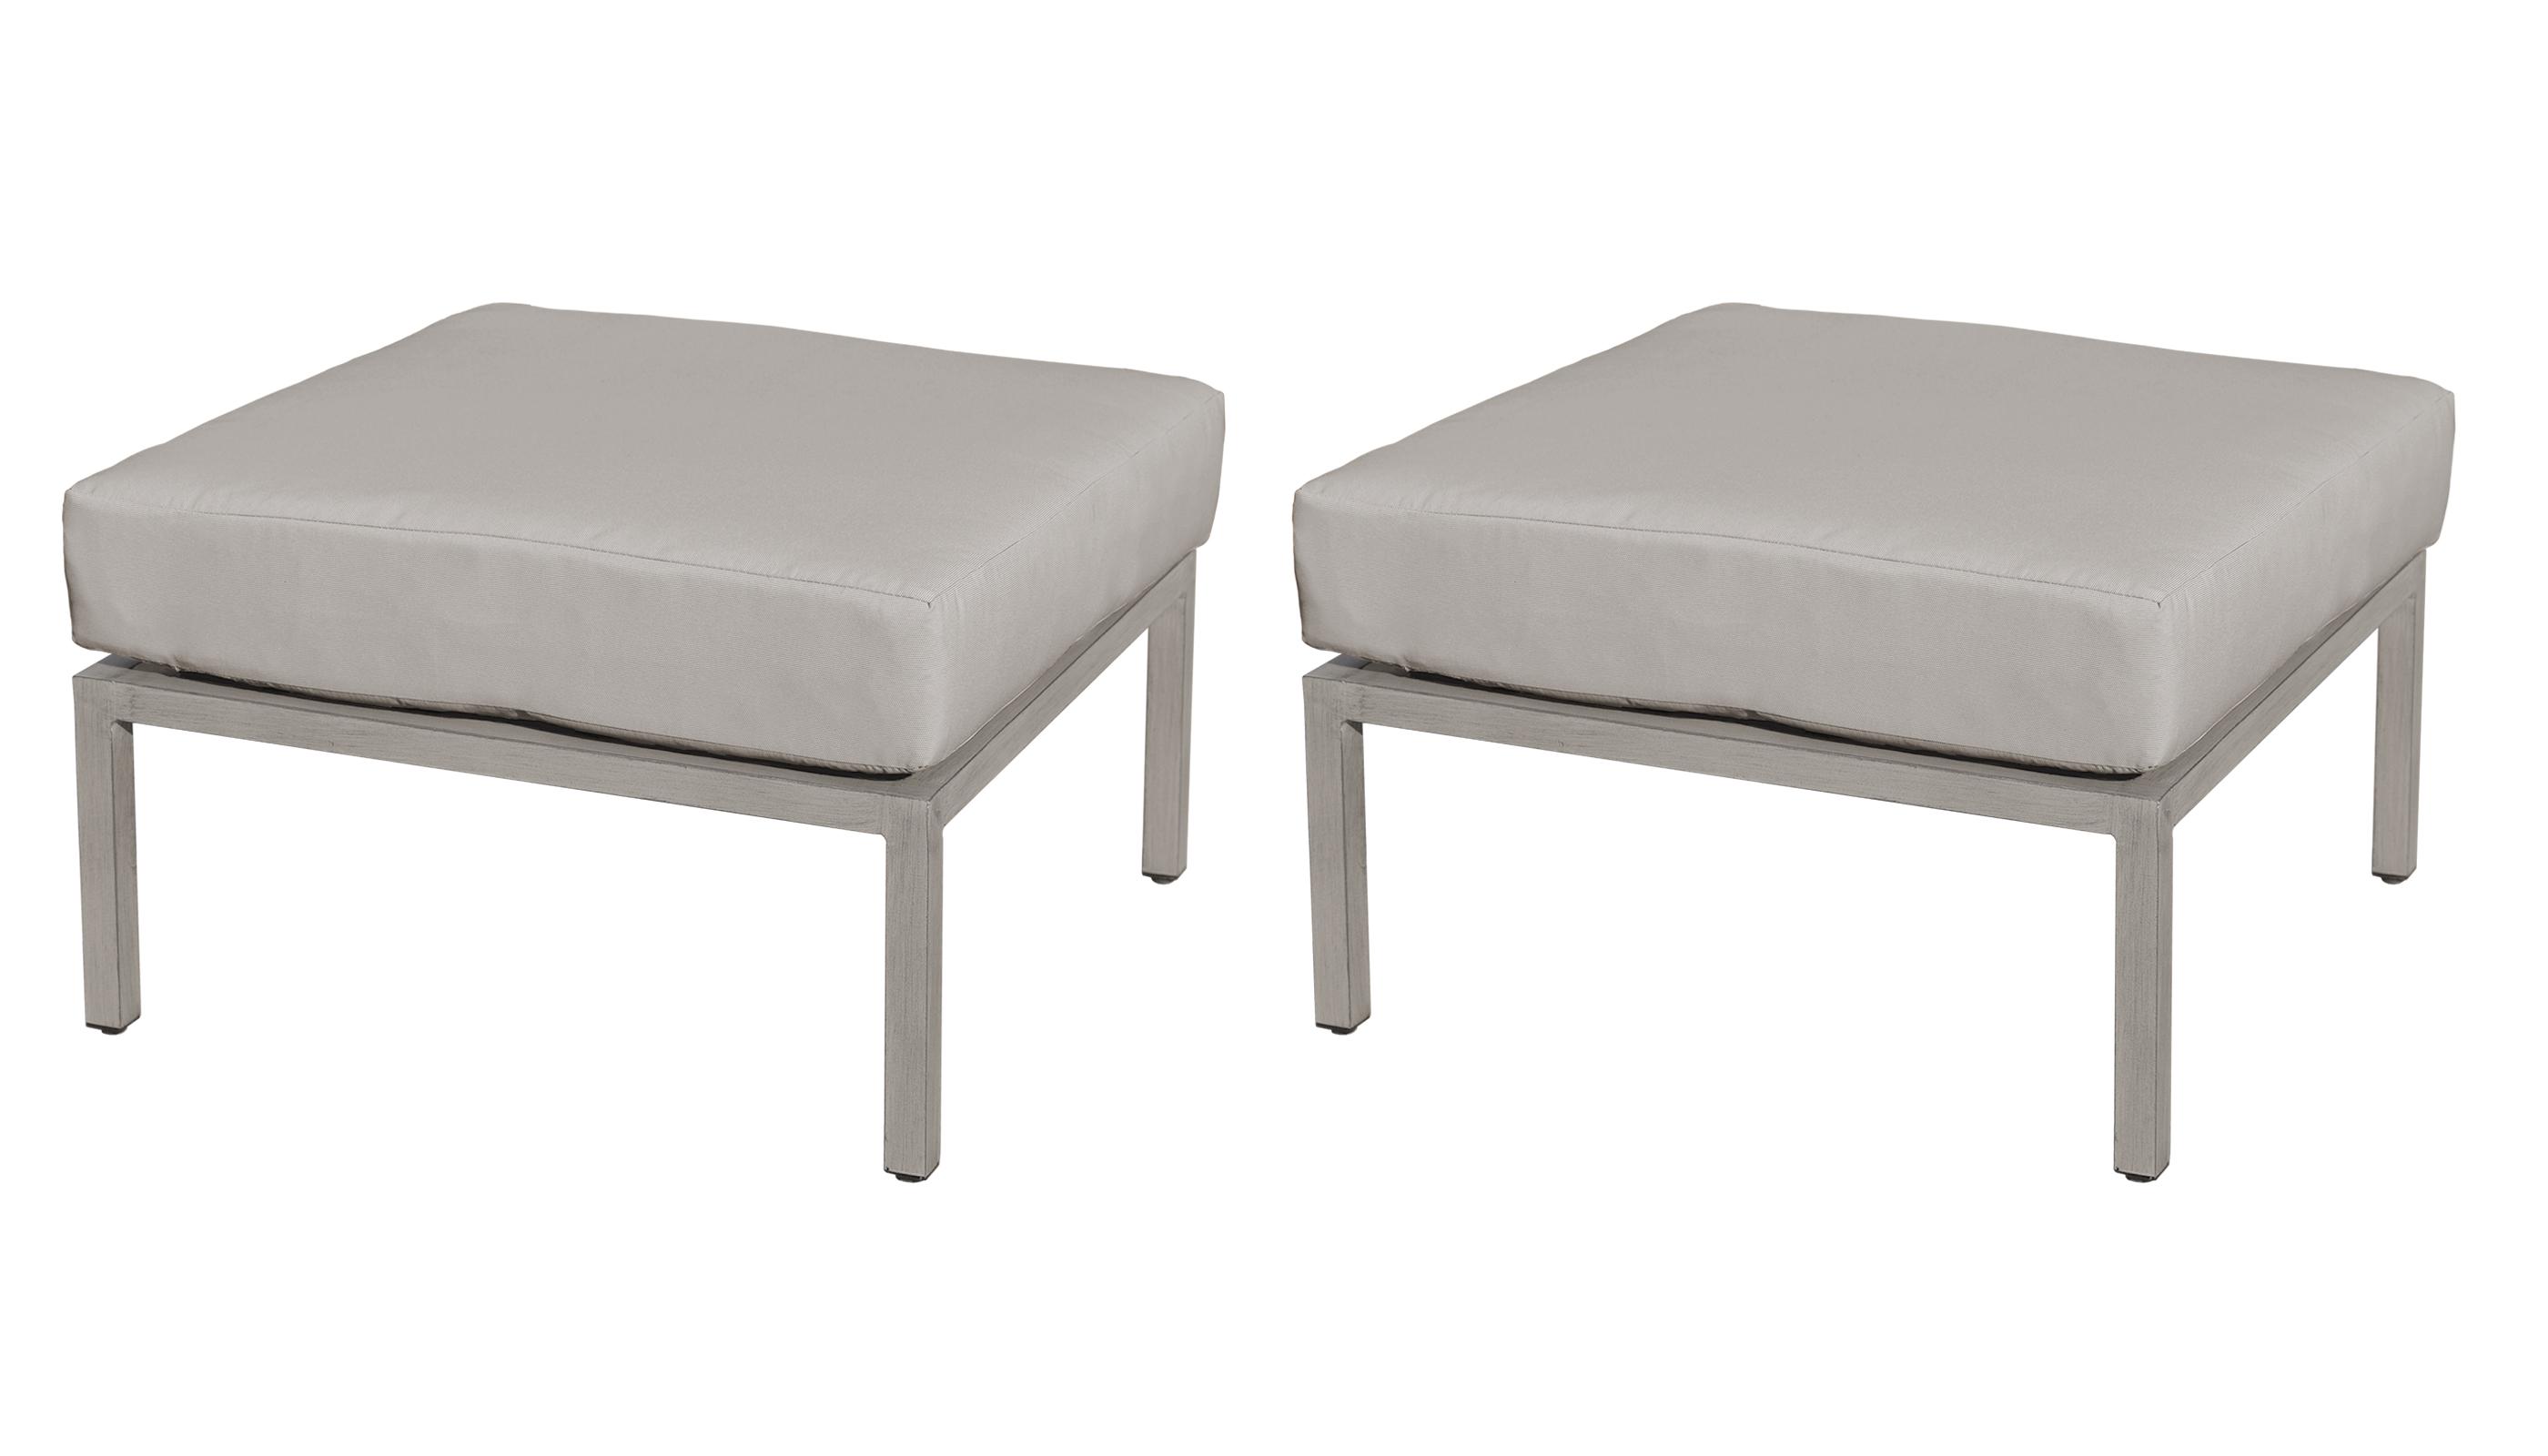 Awe Inspiring Carlisle Ottoman 2 Per Box Uwap Interior Chair Design Uwaporg